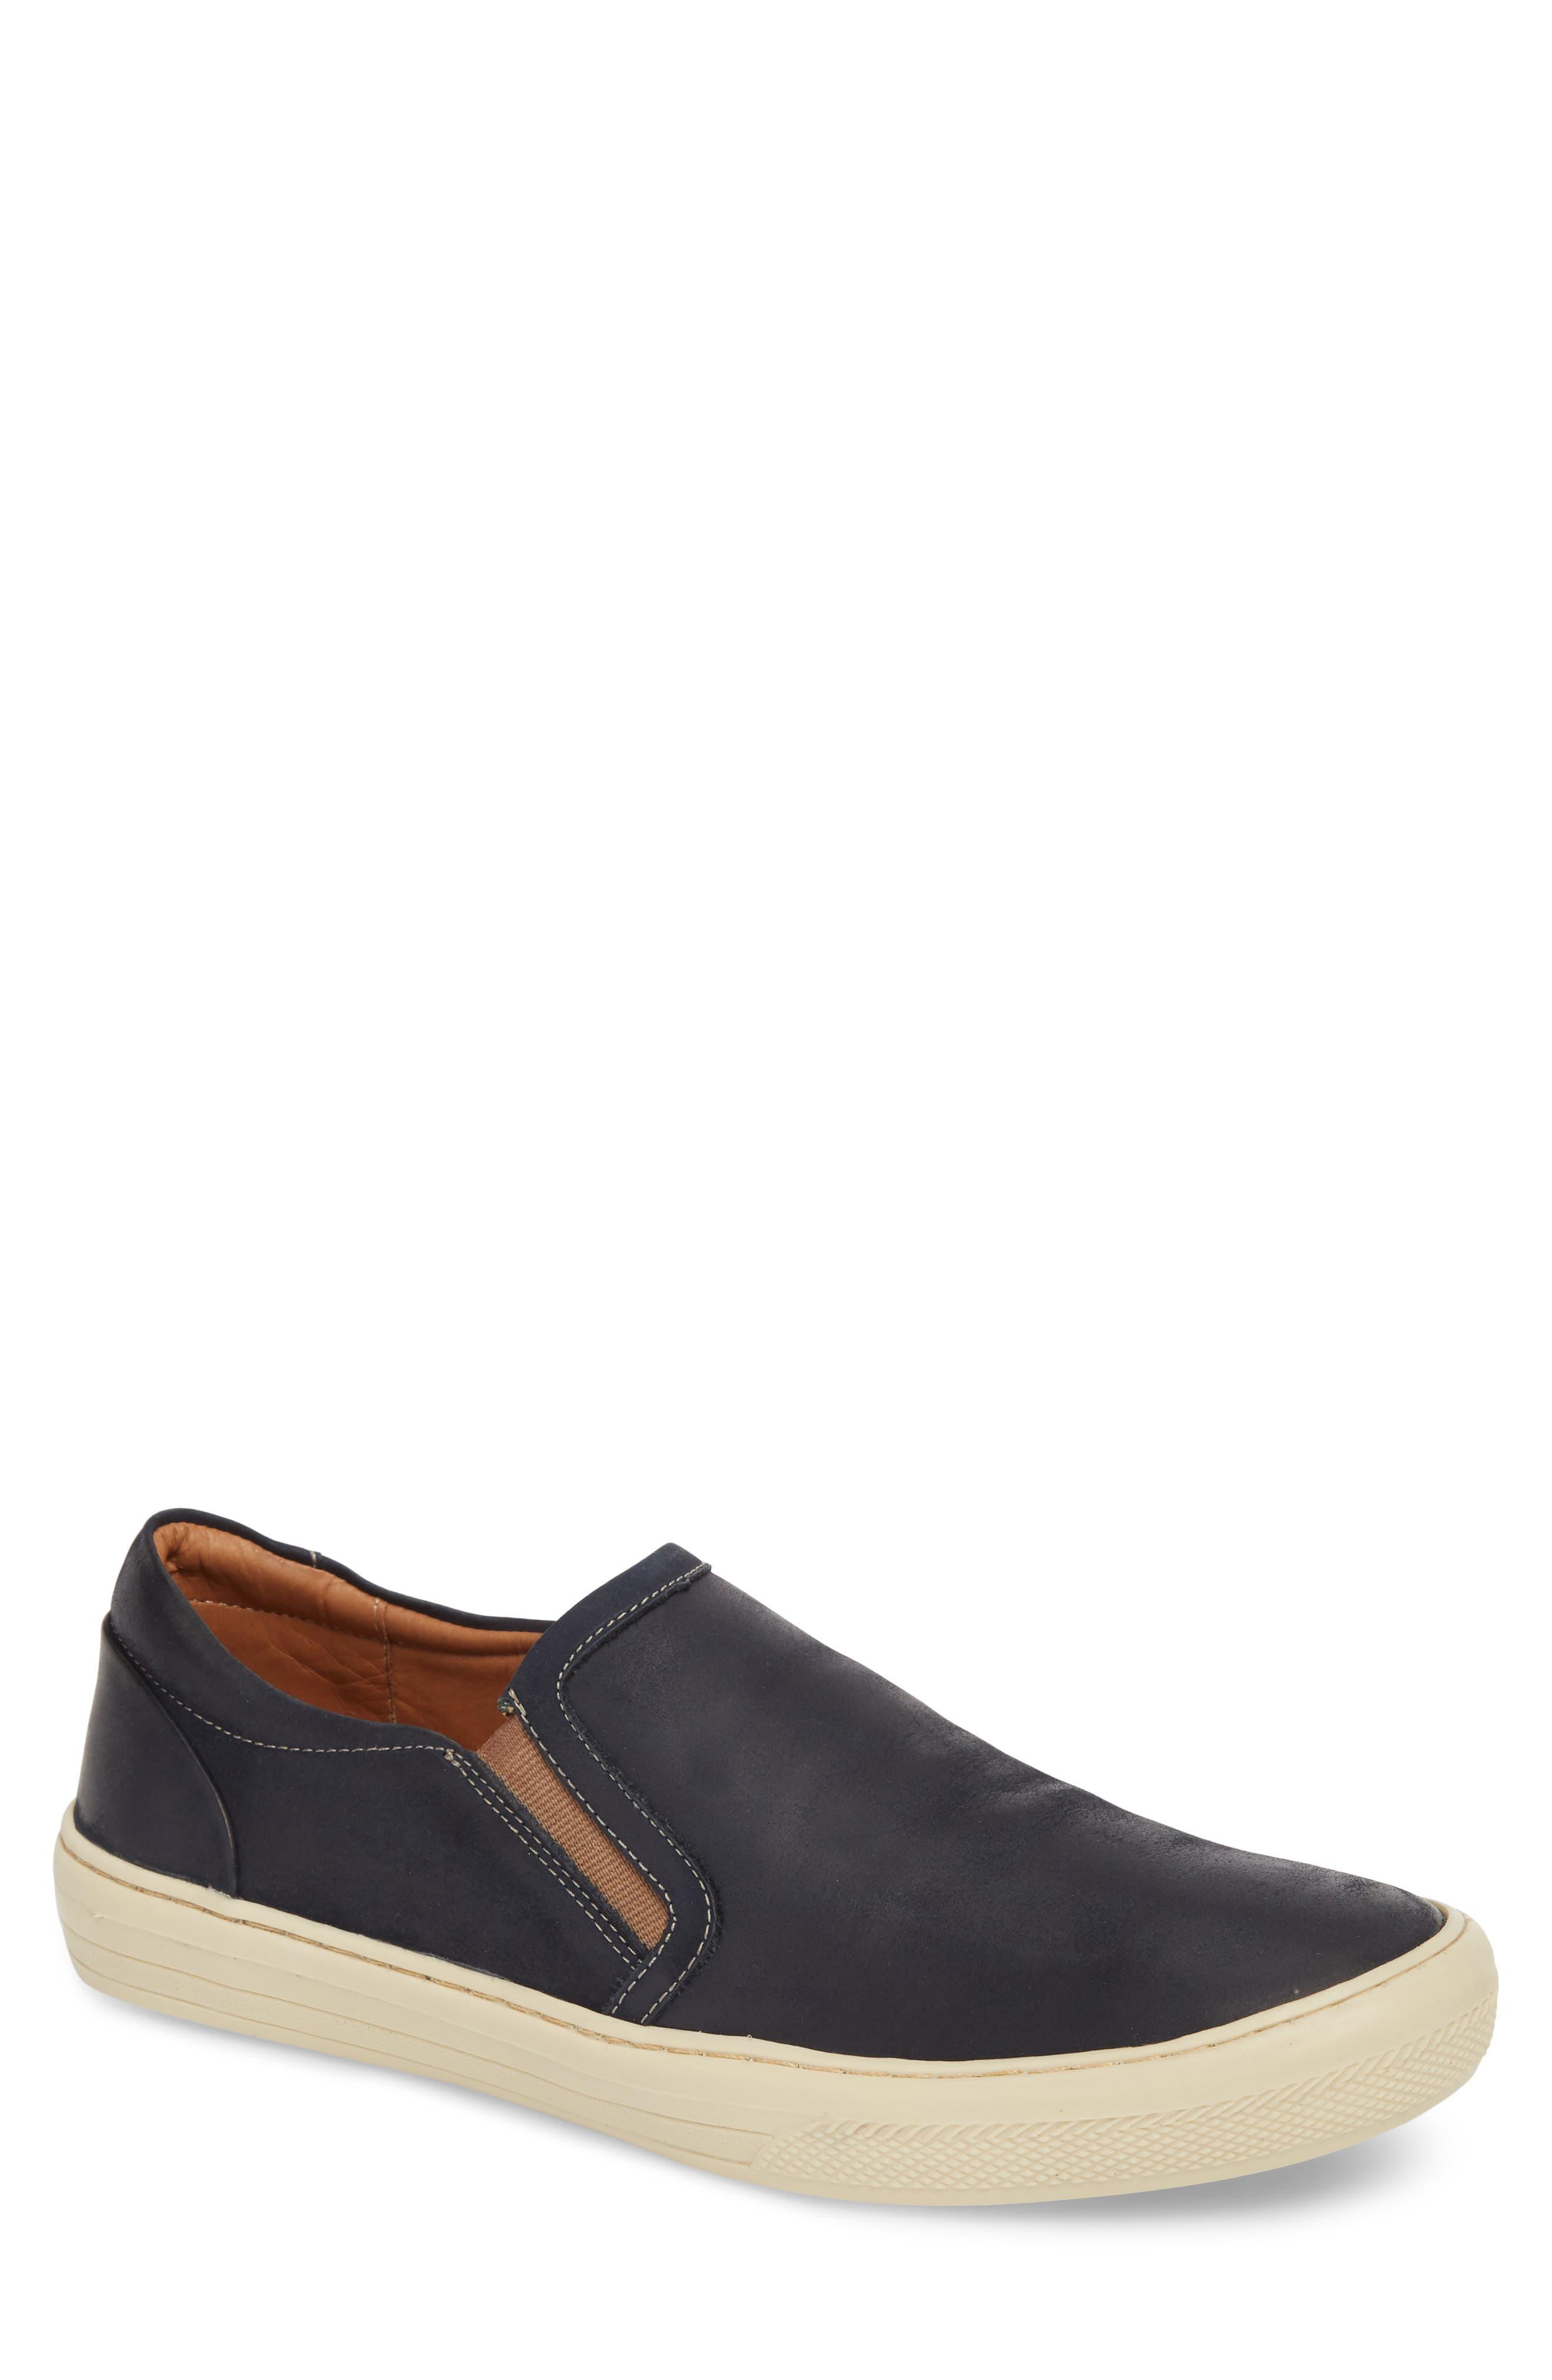 Main Image - ANATOMIC & CO. Itabuna Slip-On Sneaker (Men)